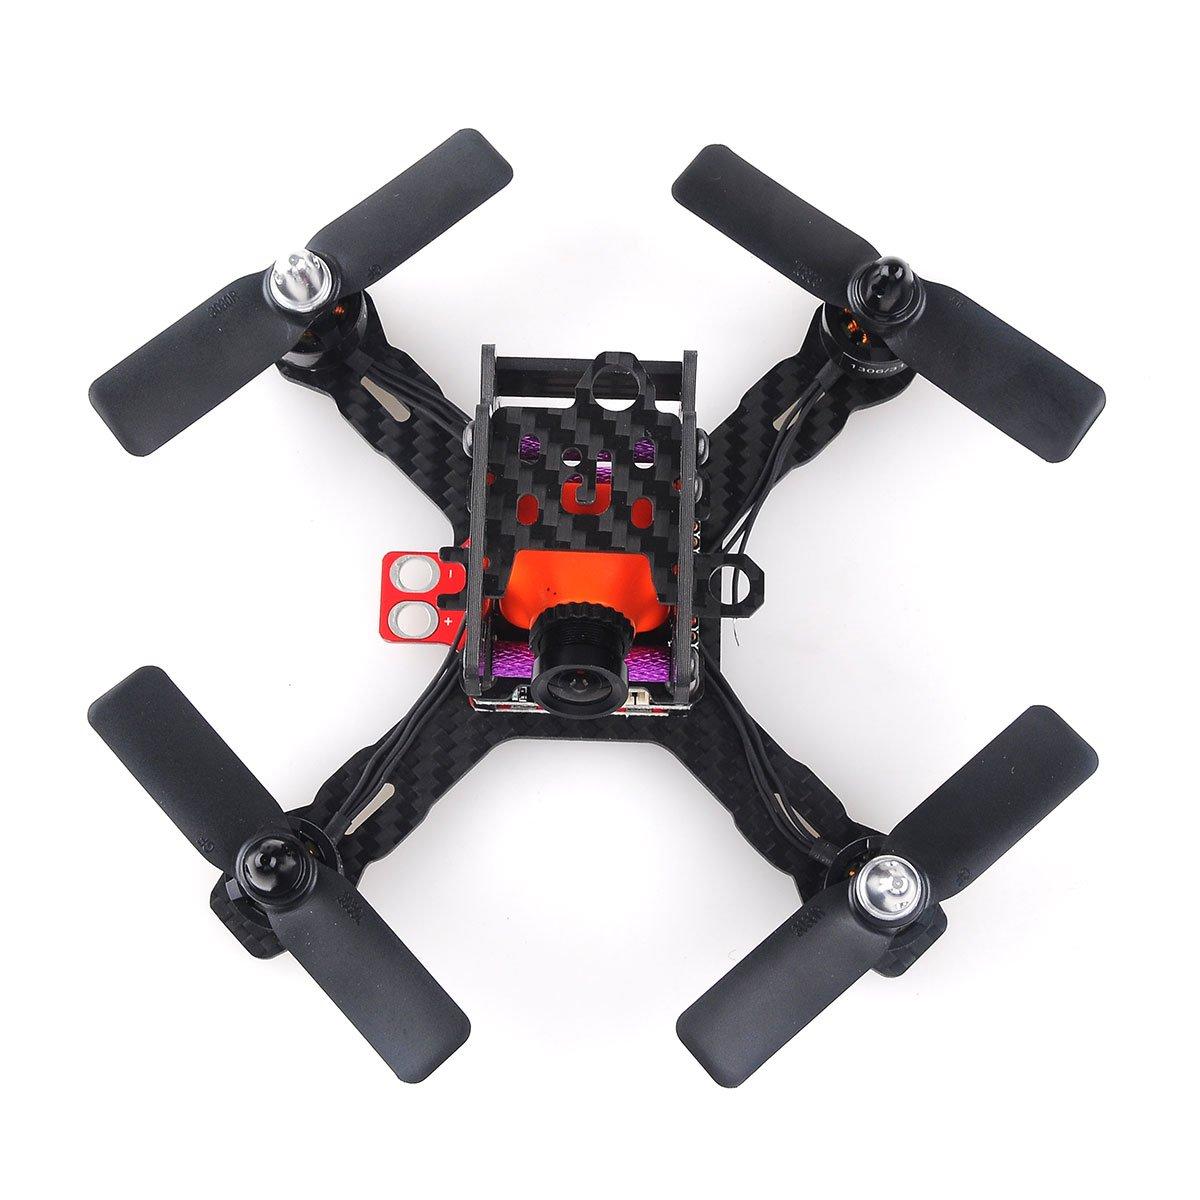 Amazon.com: Crazepony X130 FPV Racing Drone Mini Quadcopter Carbon ...